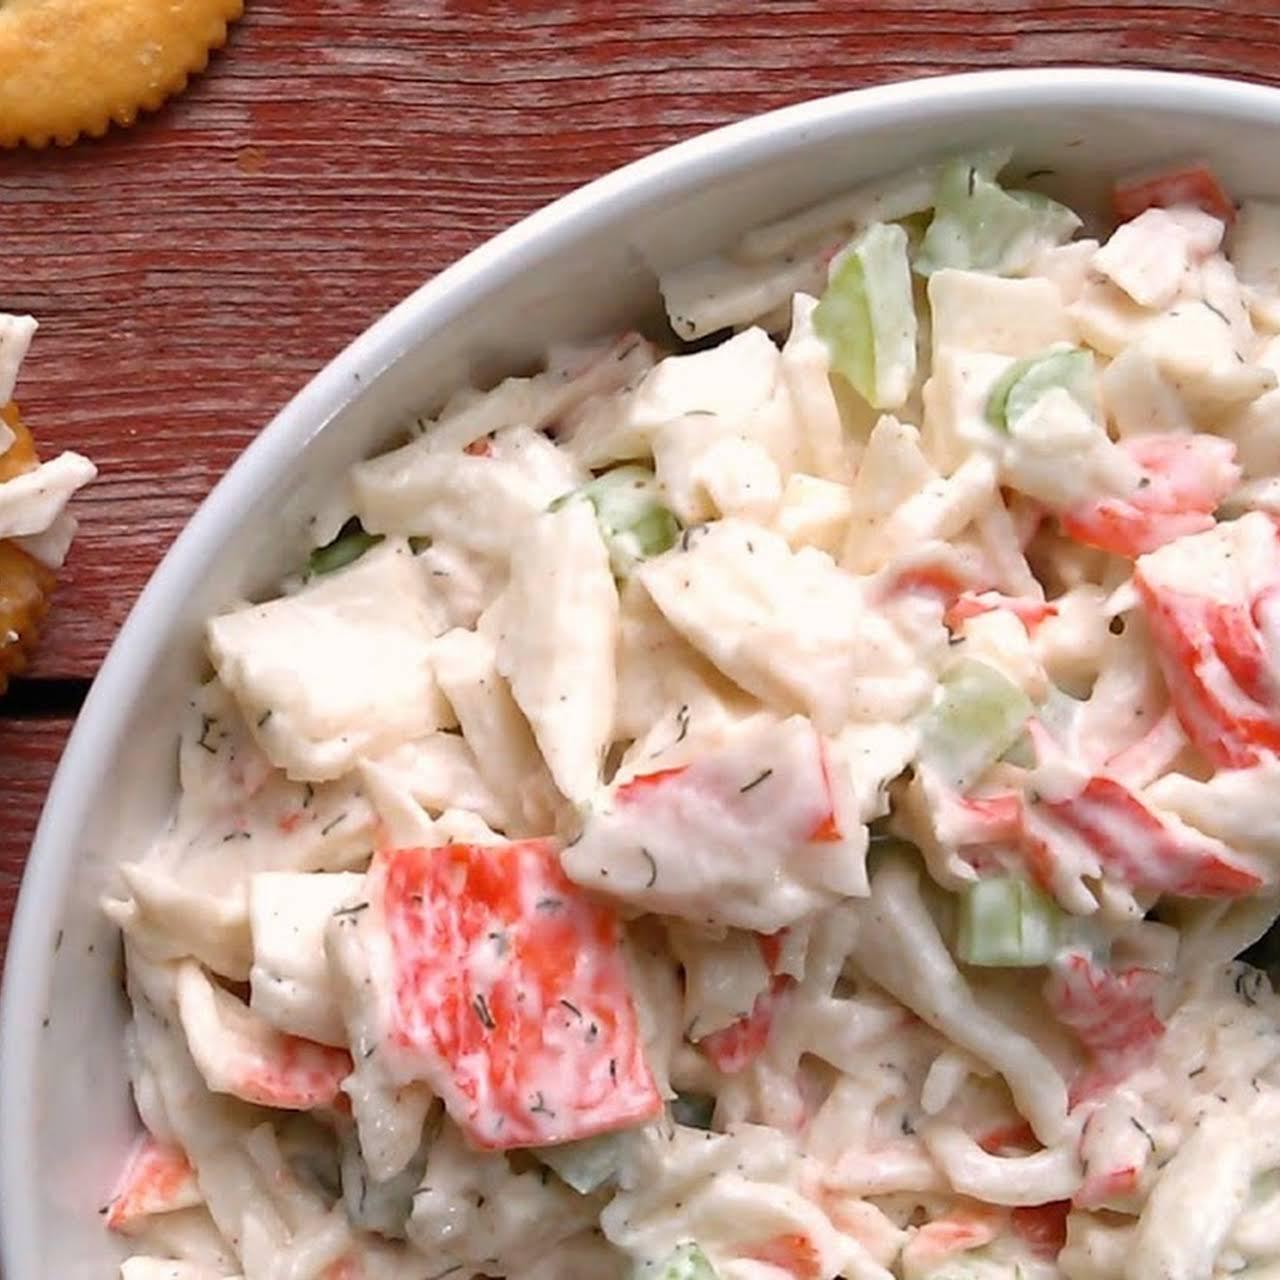 Imitation Crab Salad Recipe With Vinegar